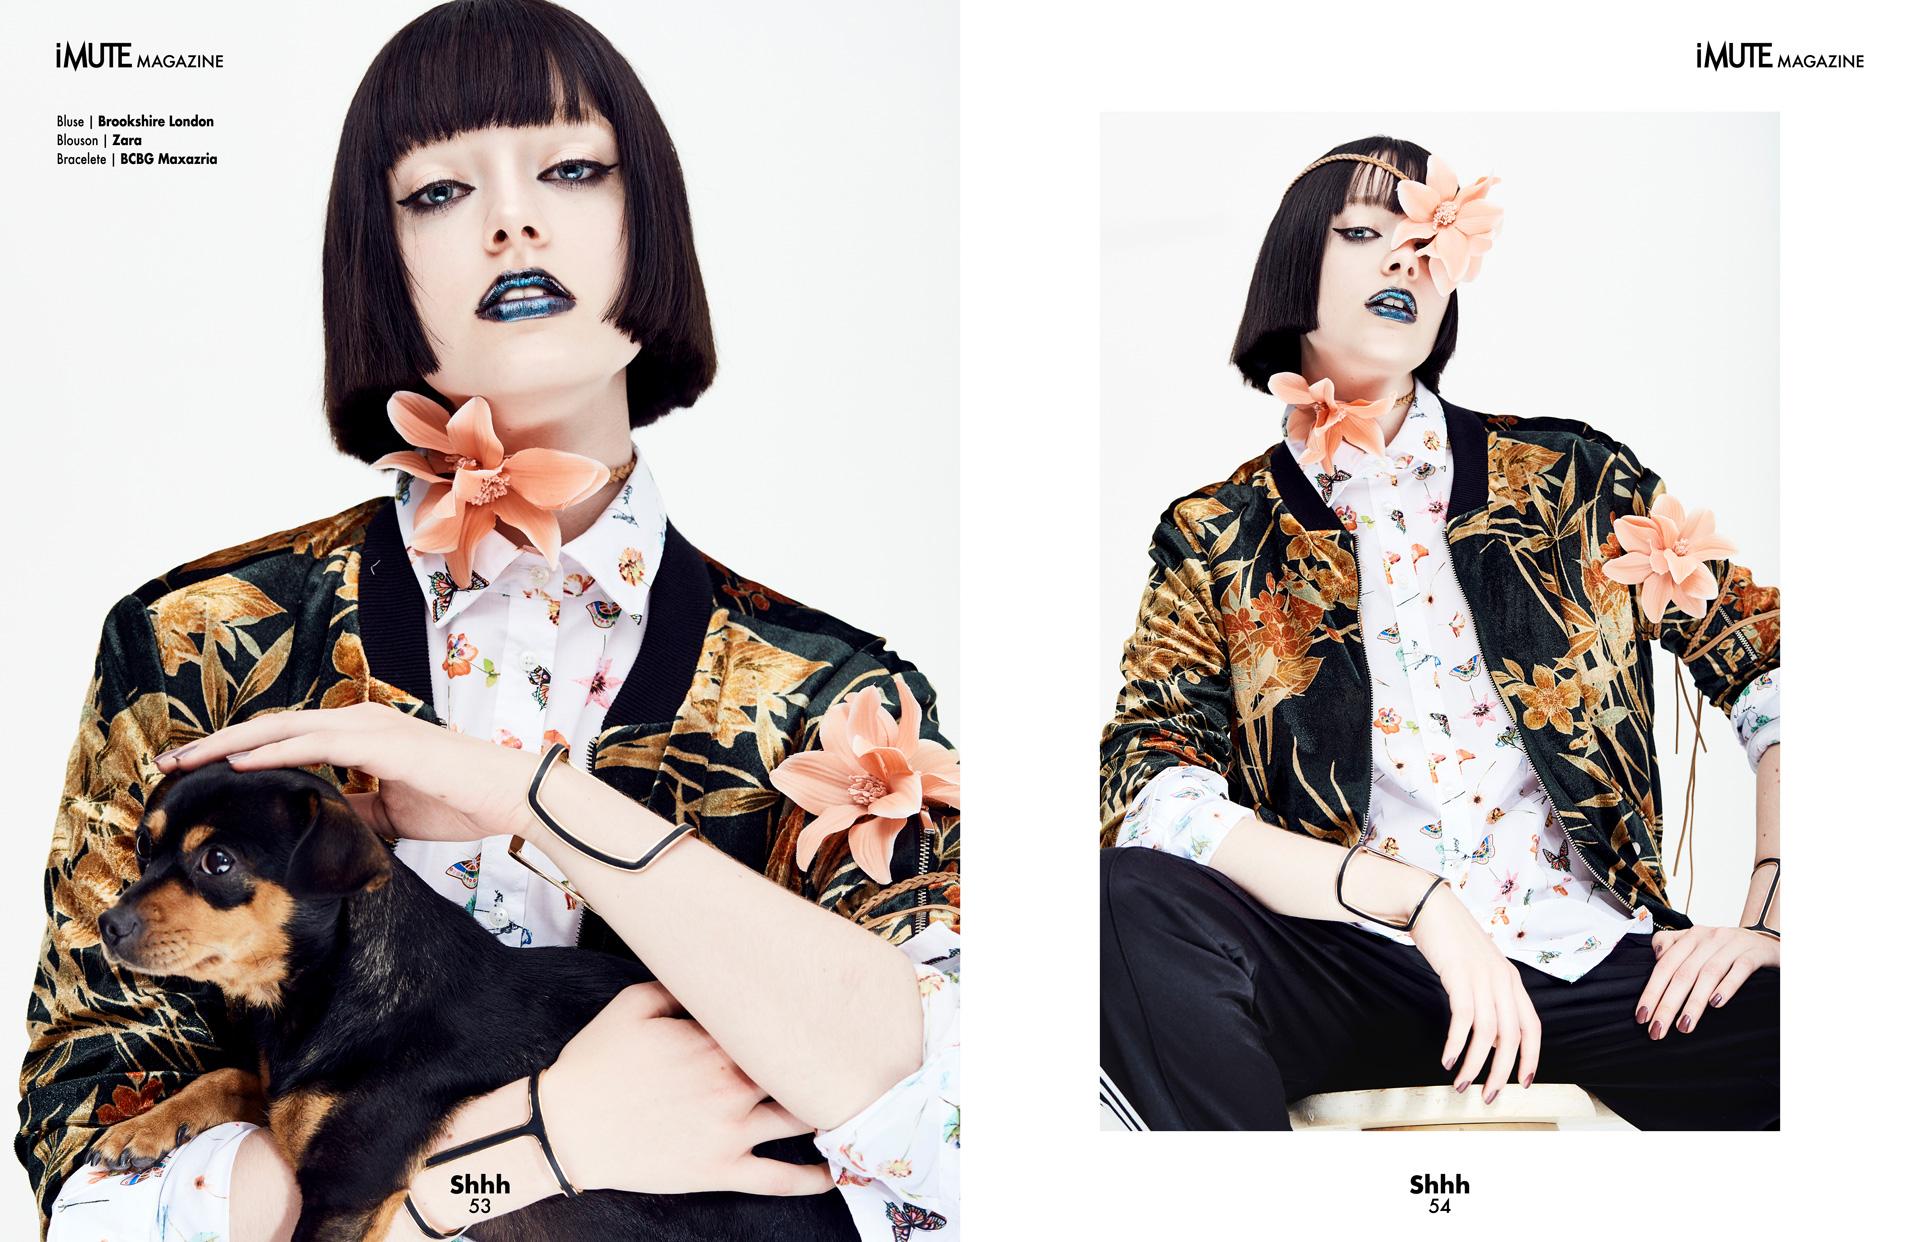 The Florist | iMute Magazine #19 | Summer Issue Photographer|Reza Norifarahani Models| Anja Abraham @ MD Management Stylist|Julia Dorothee Müller @ Bigoudi Makeup| Slavica Pavlovic